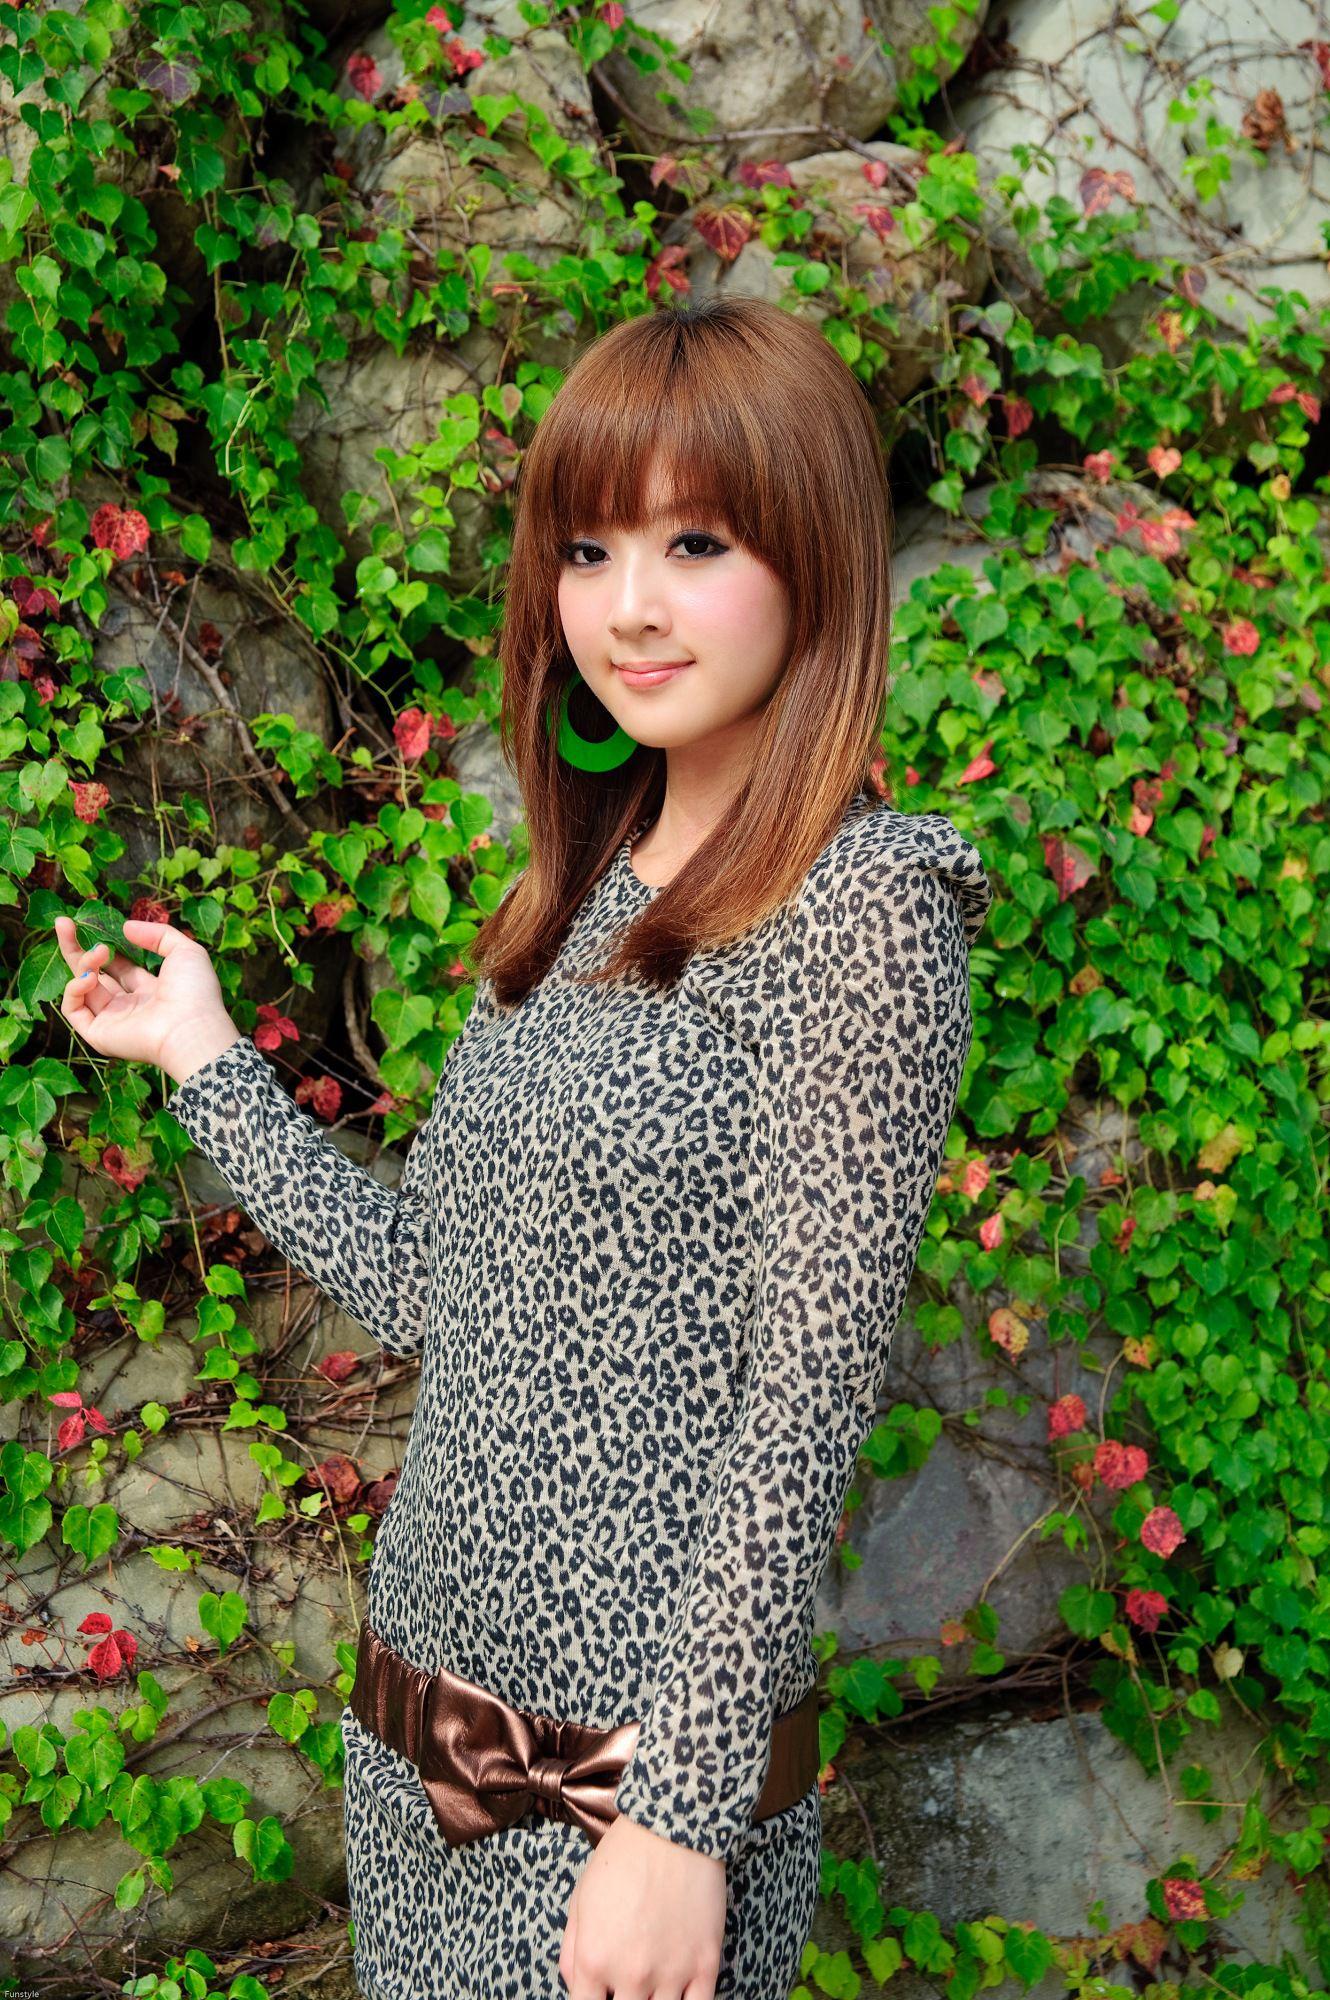 VOL.1705 [台湾正妹]外拍阳光正妹妹子:张凯洁高品质写真套图(74P)